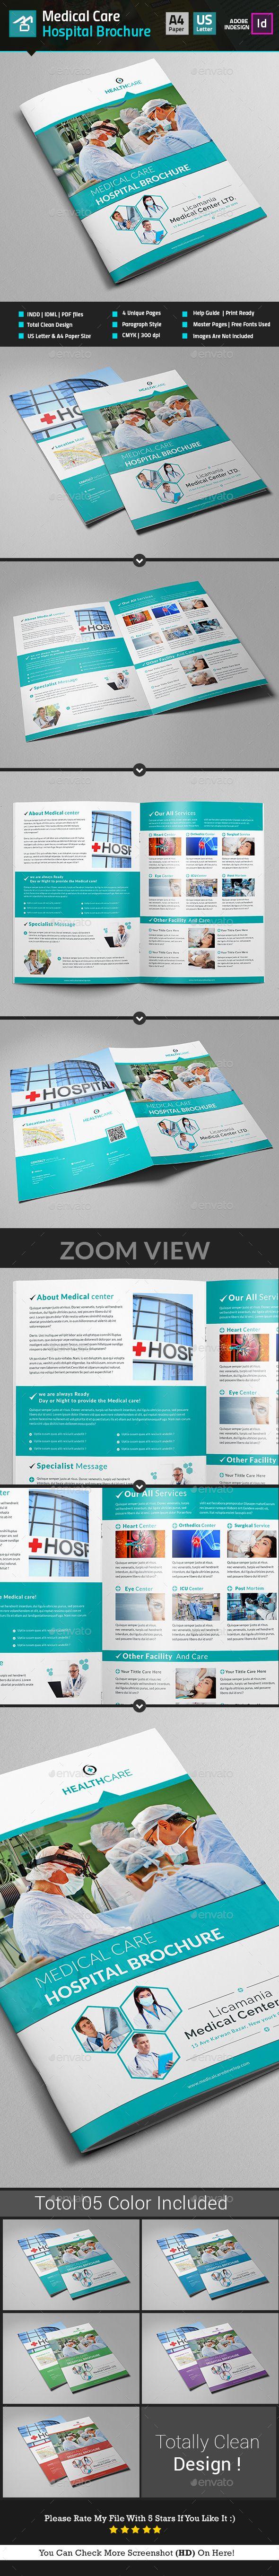 Medical Center / Hospital Brochure Template InDesign INDD. Download here: http://graphicriver.net/item/medical-center-hospital-brochure-template/16858116?ref=ksioks